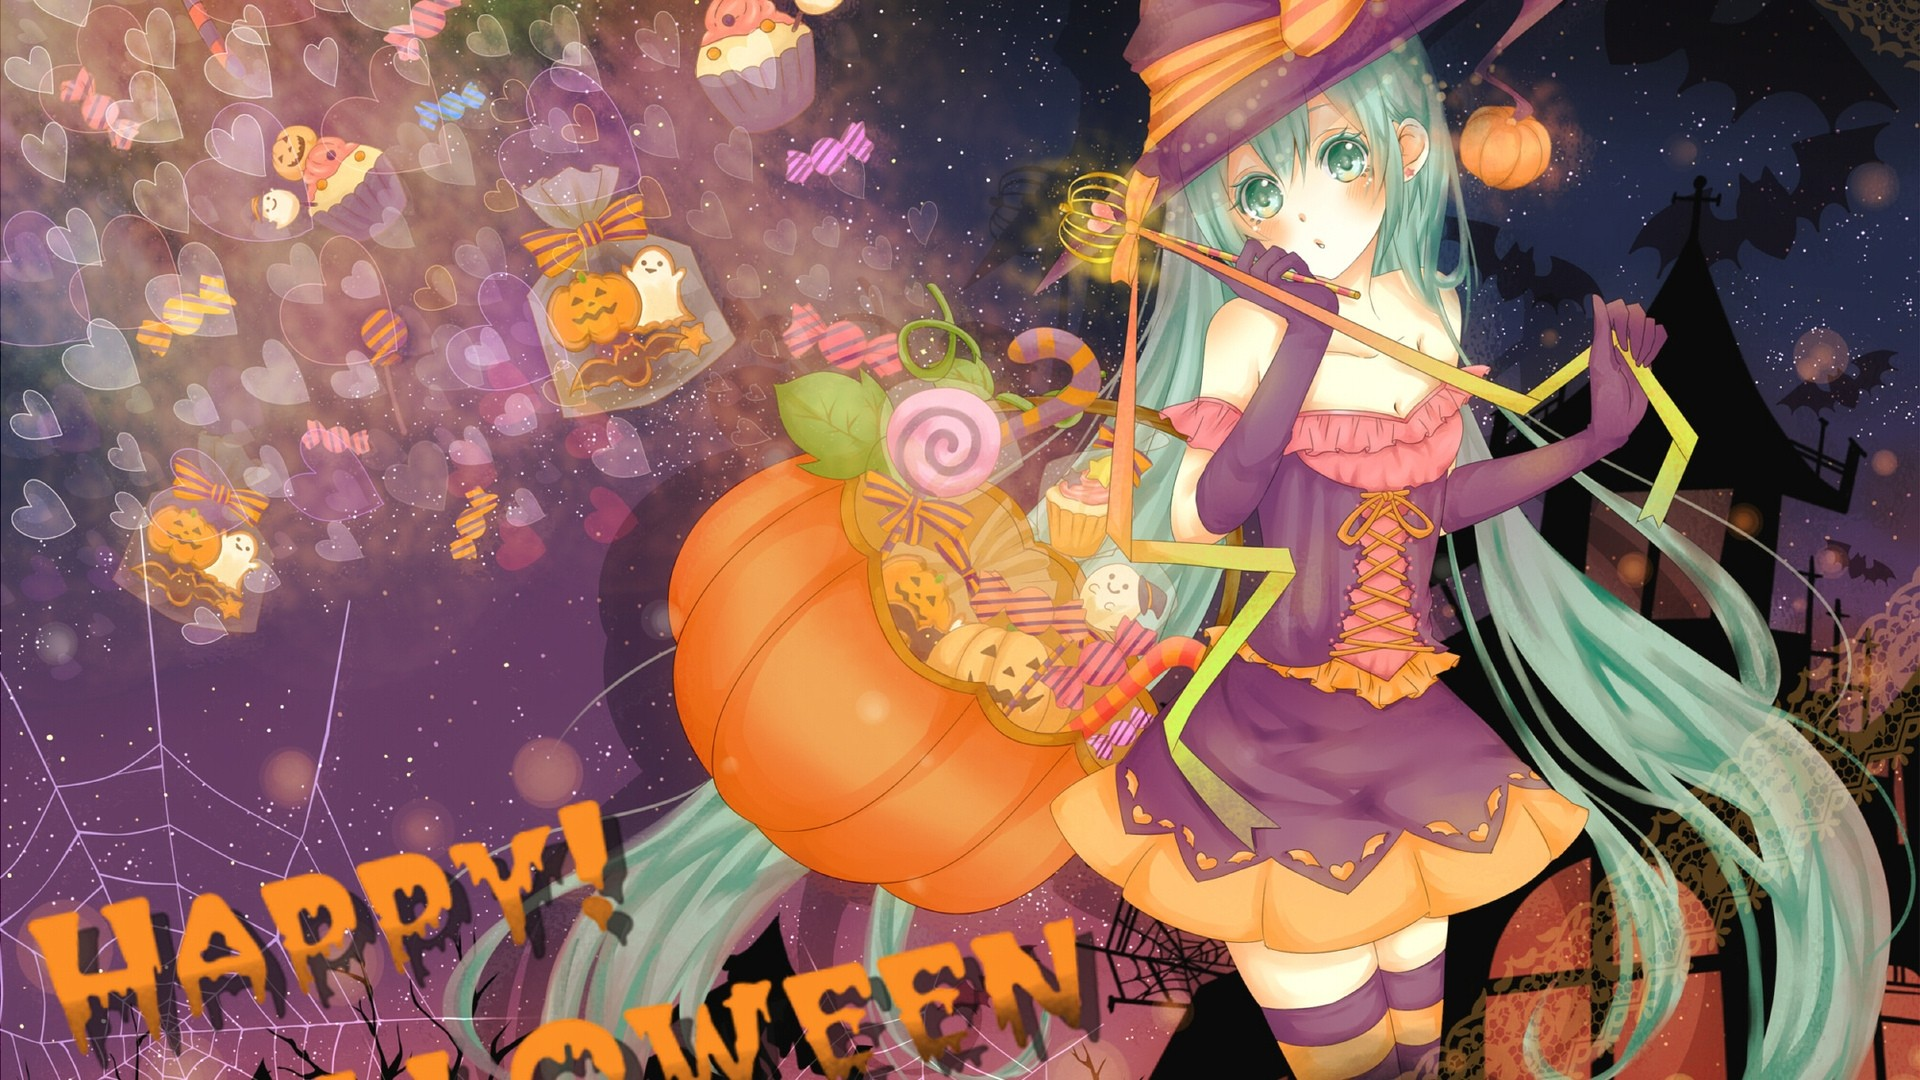 Halloween Anime Wallpaper image hd